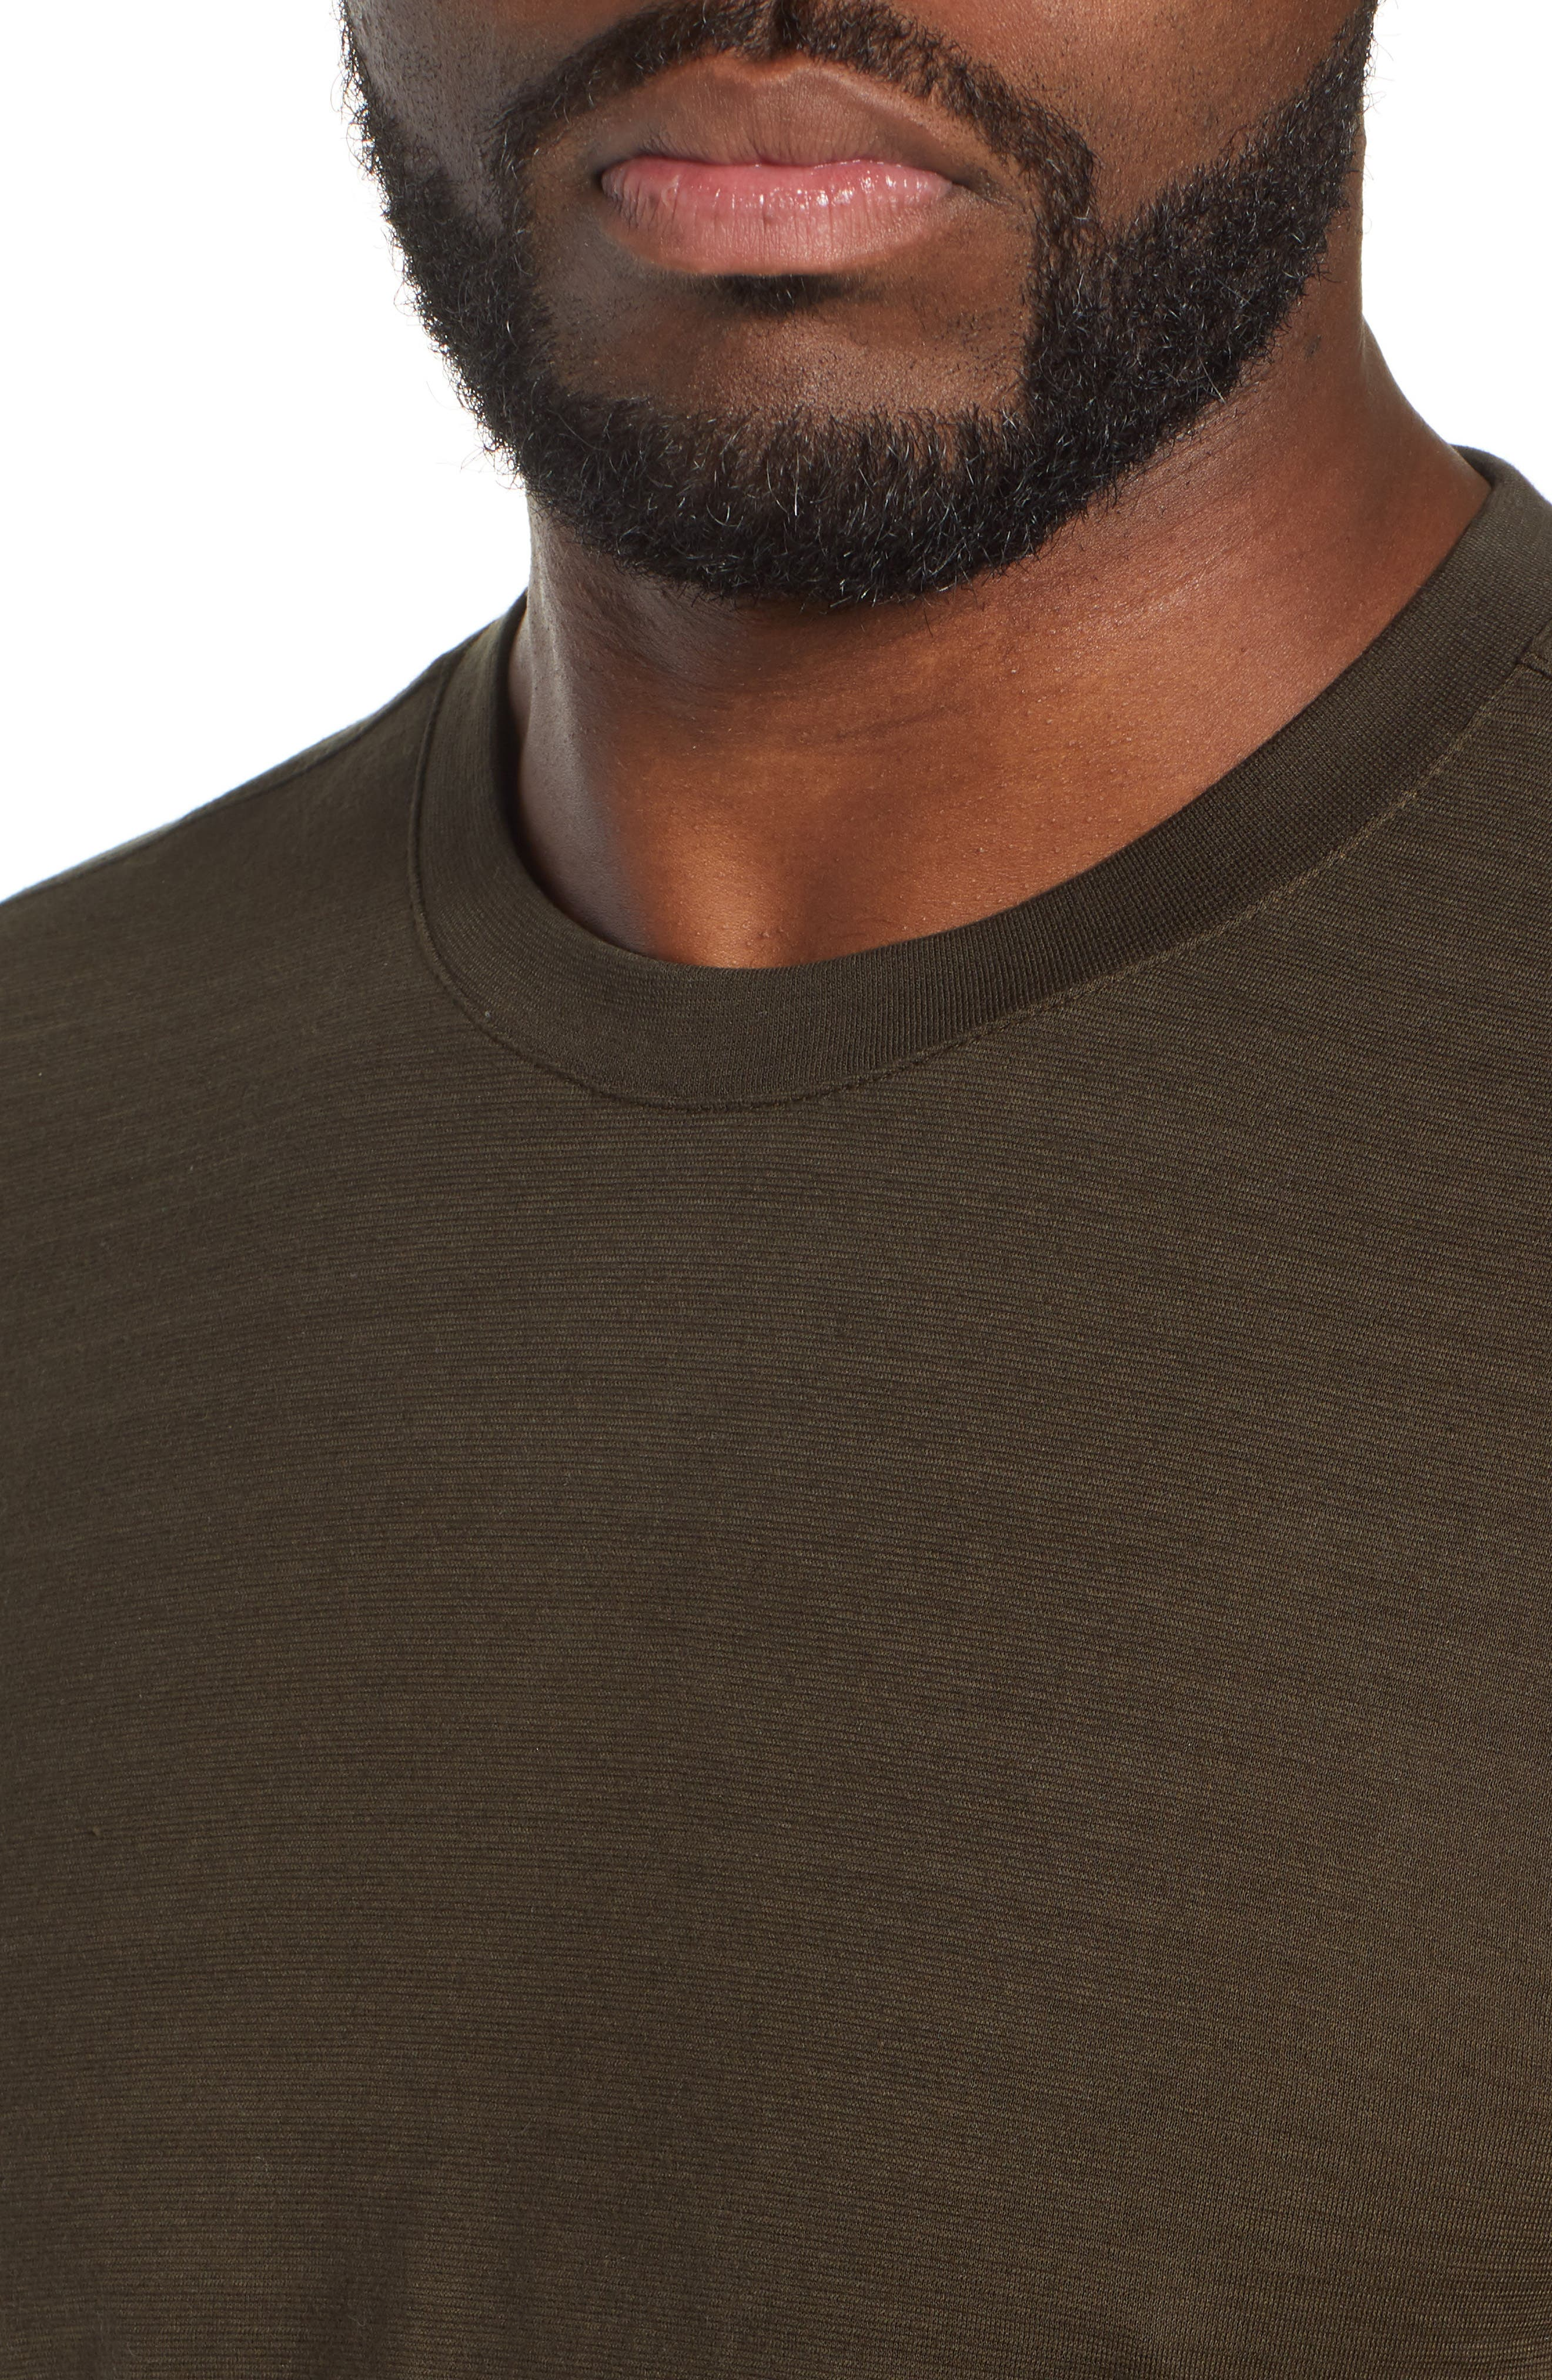 Tenison Long Sleeve Crewneck T-Shirt,                             Alternate thumbnail 4, color,                             DARK GREEN